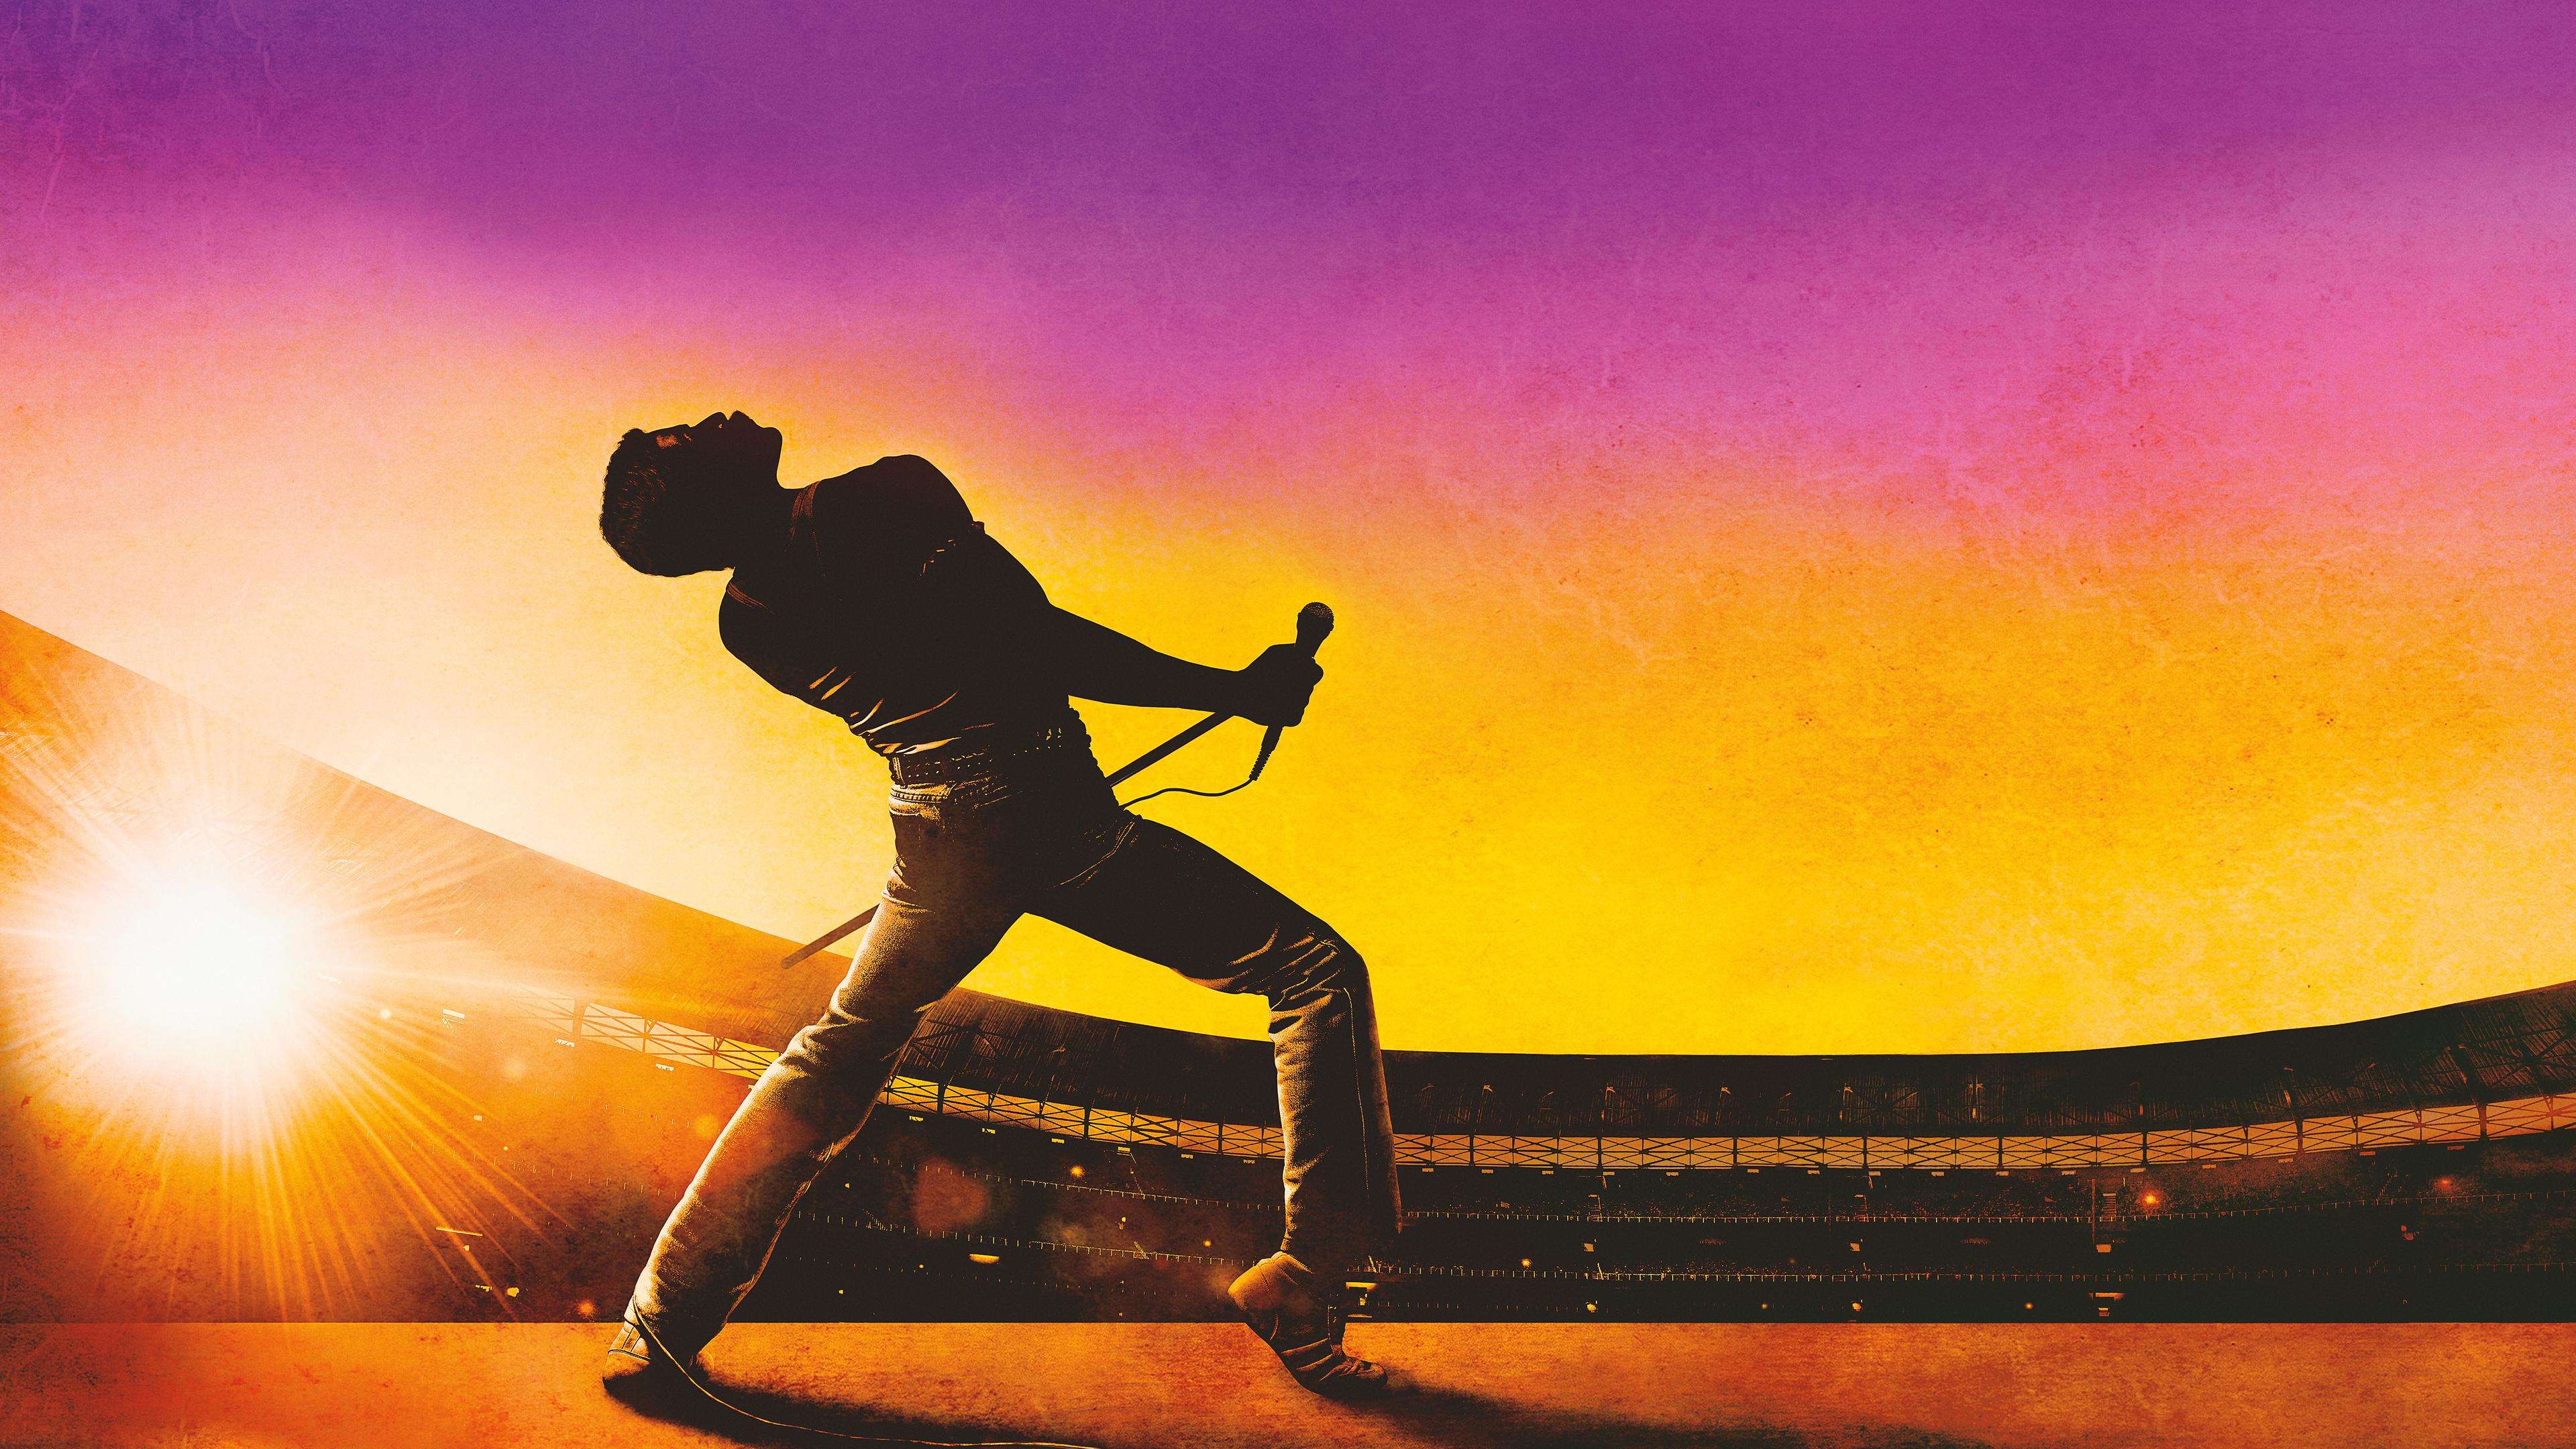 bohemian rhapsody 5k 2018 1539979669 - Bohemian Rhapsody 5k 2018 - rami malek wallpapers, movies wallpapers, hd-wallpapers, bohemian rhapsody wallpapers, 5k wallpapers, 4k-wallpapers, 2018-movies-wallpapers